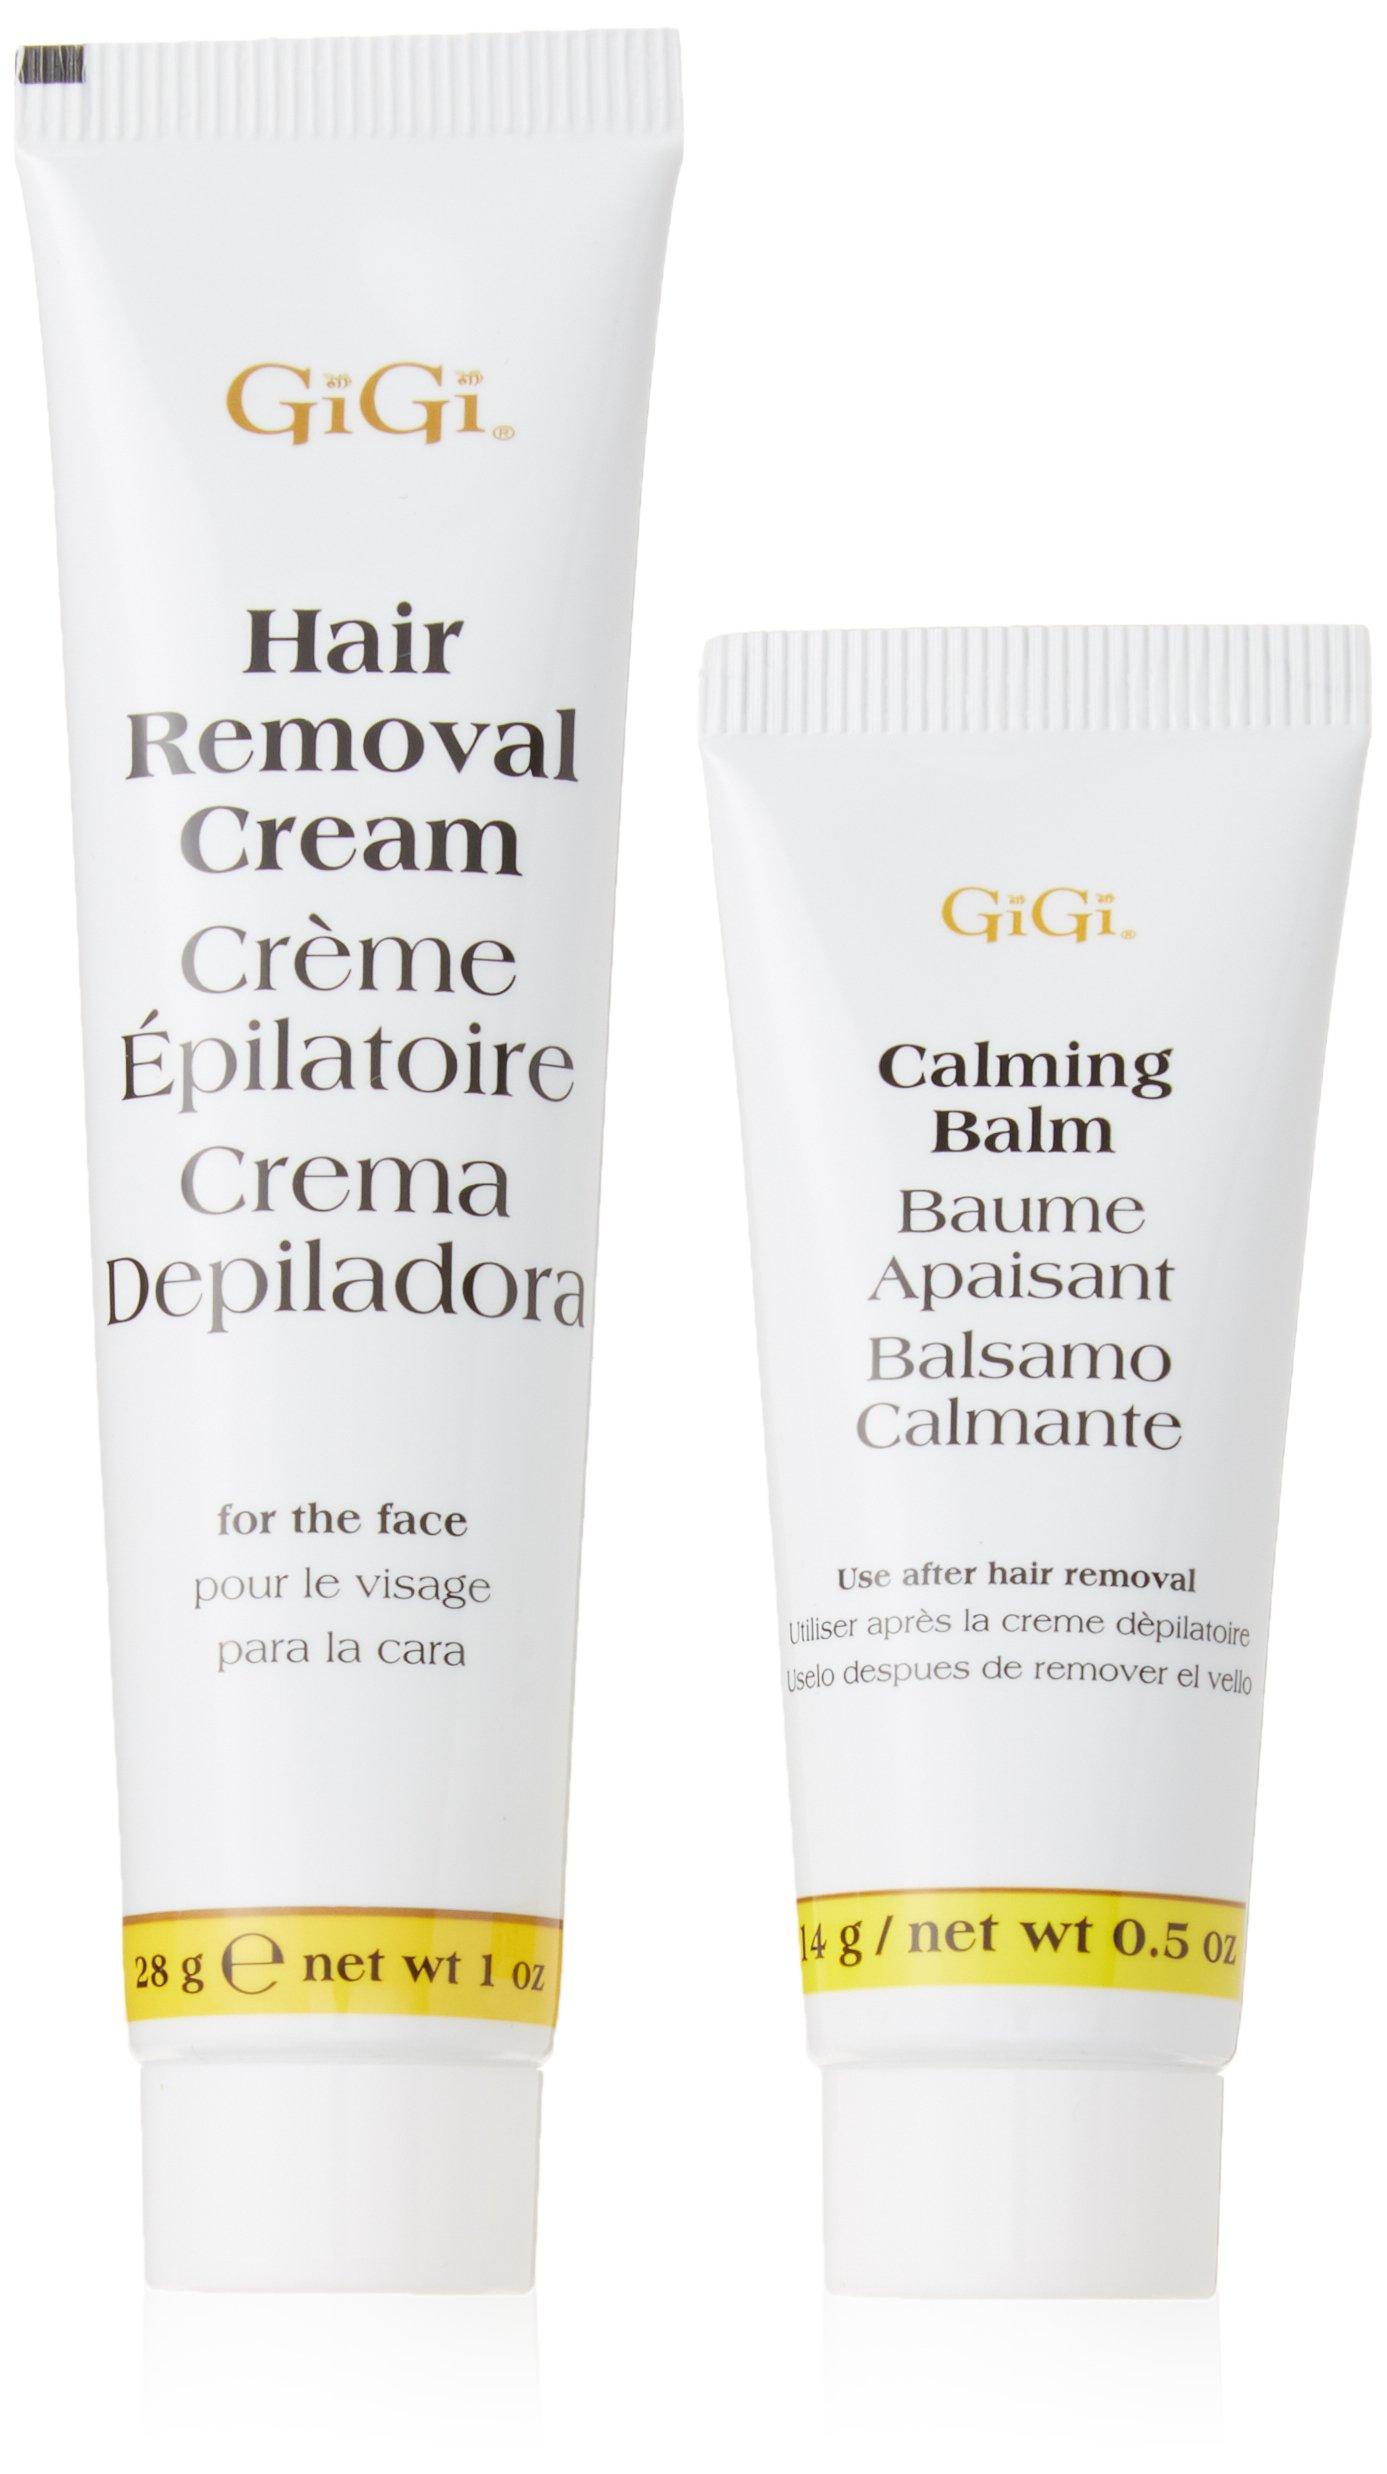 Gigi Hair Removal Cream Calming